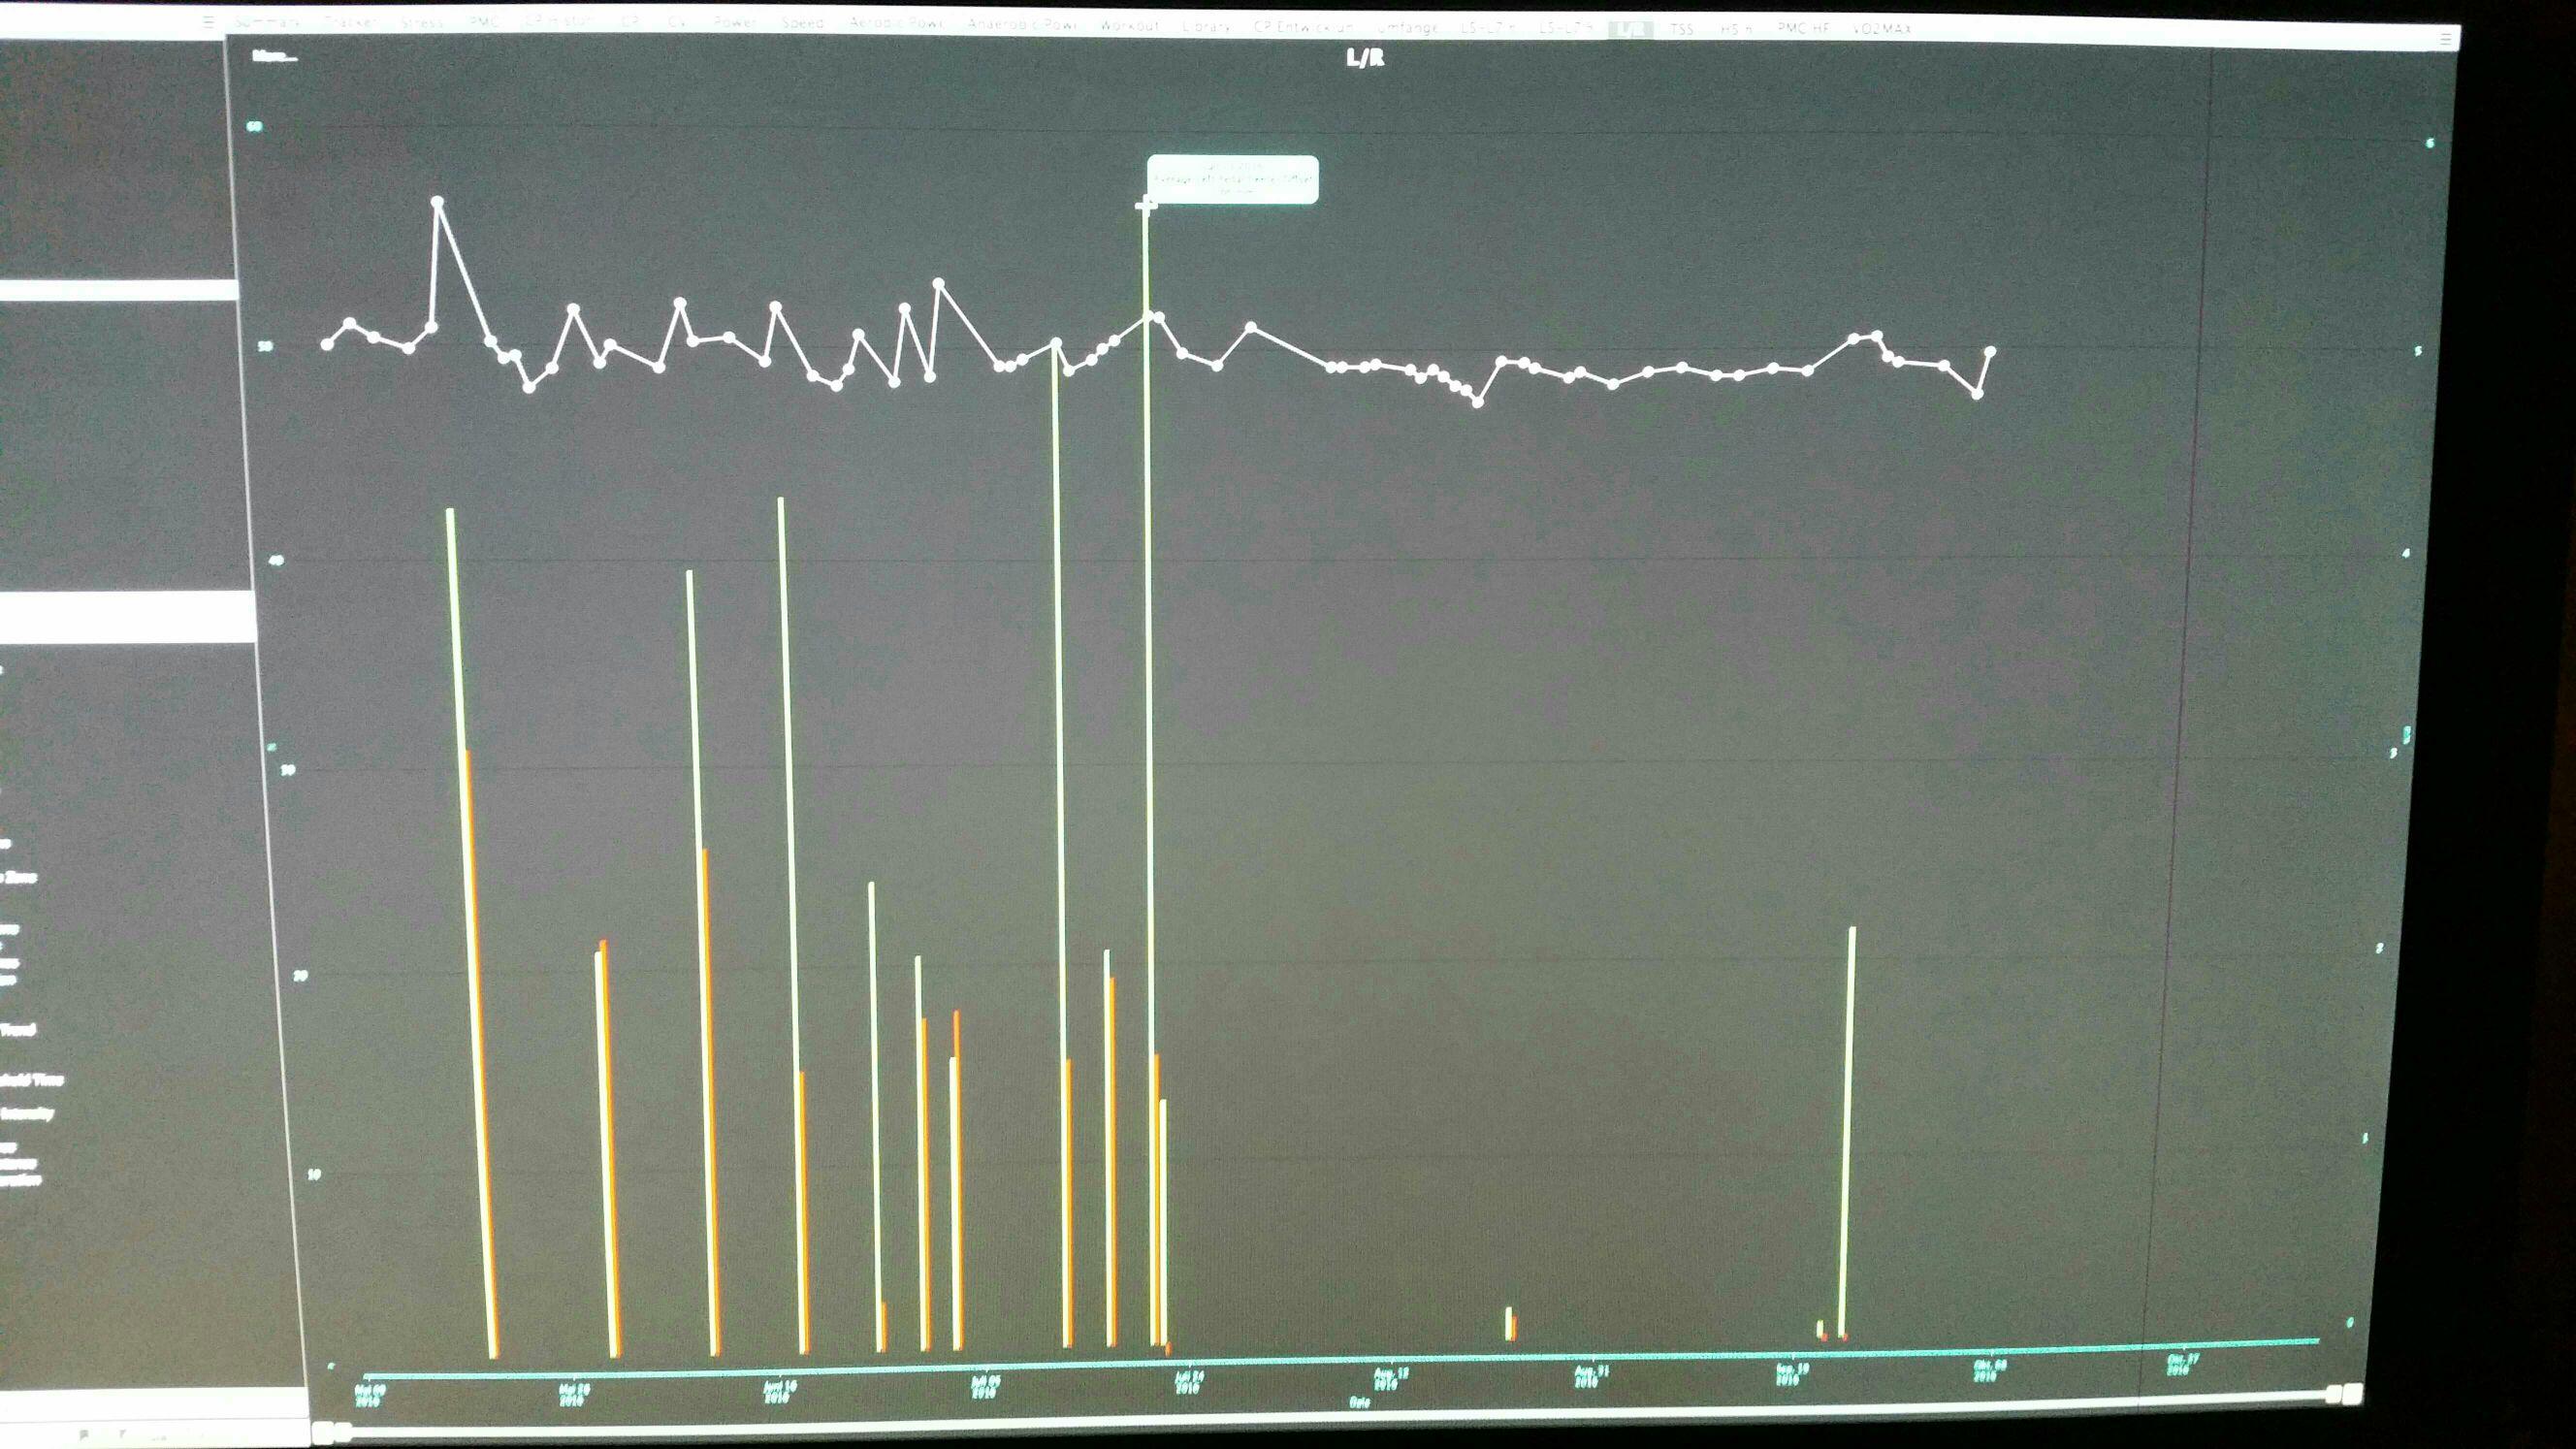 Golden Cheetah Software / Powermeter [Archiv] - Seite 13 - Tour ...